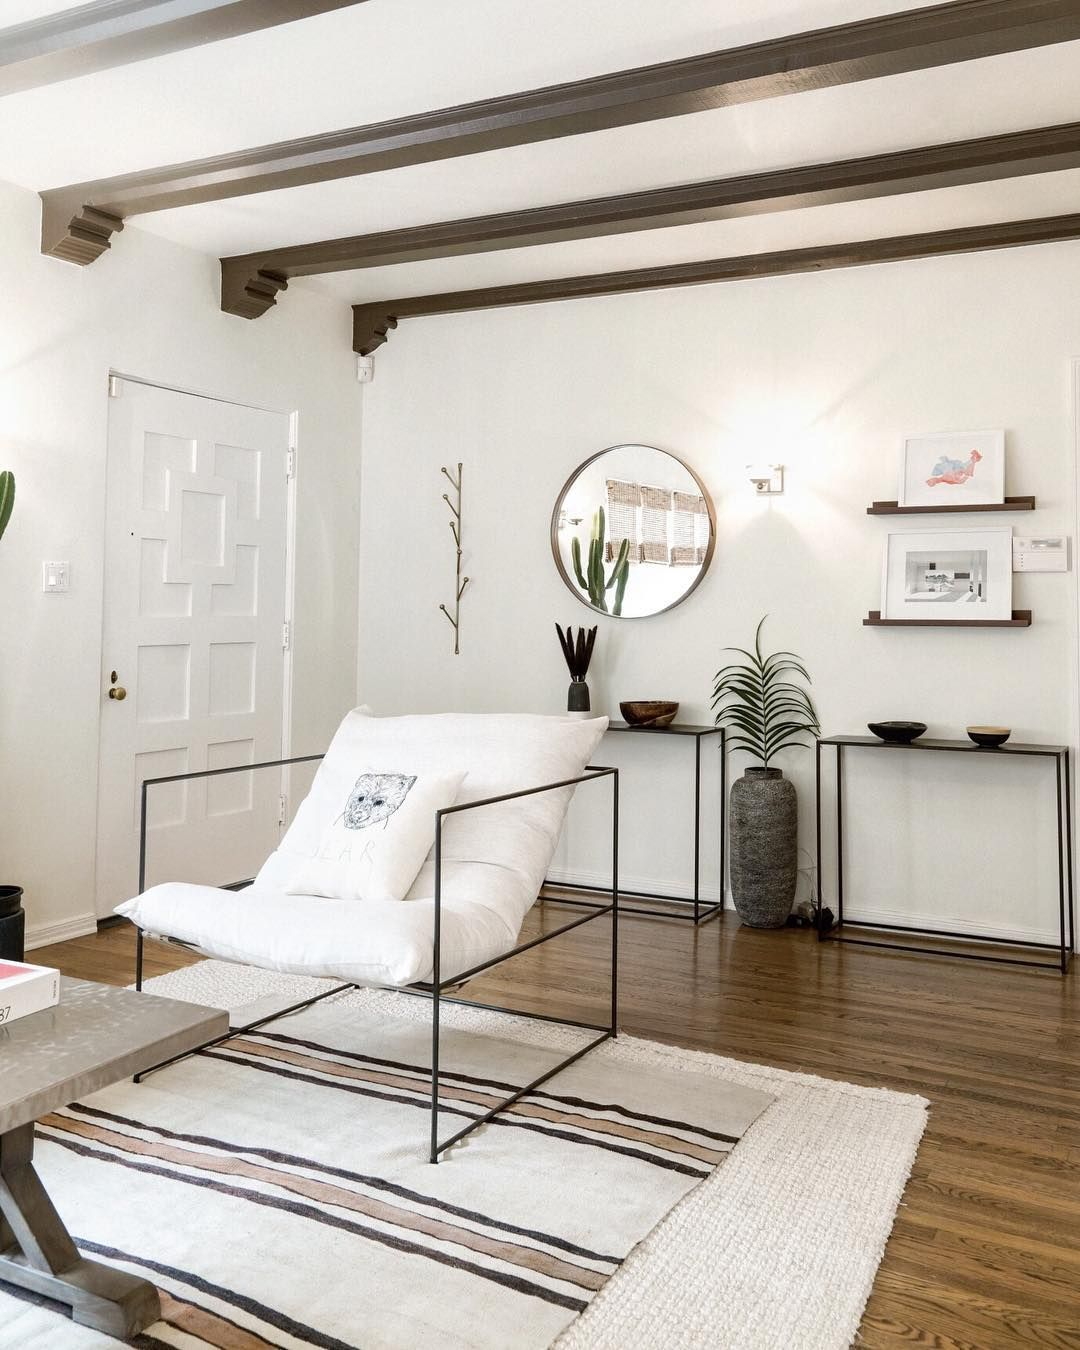 Croft House / Los Angeles